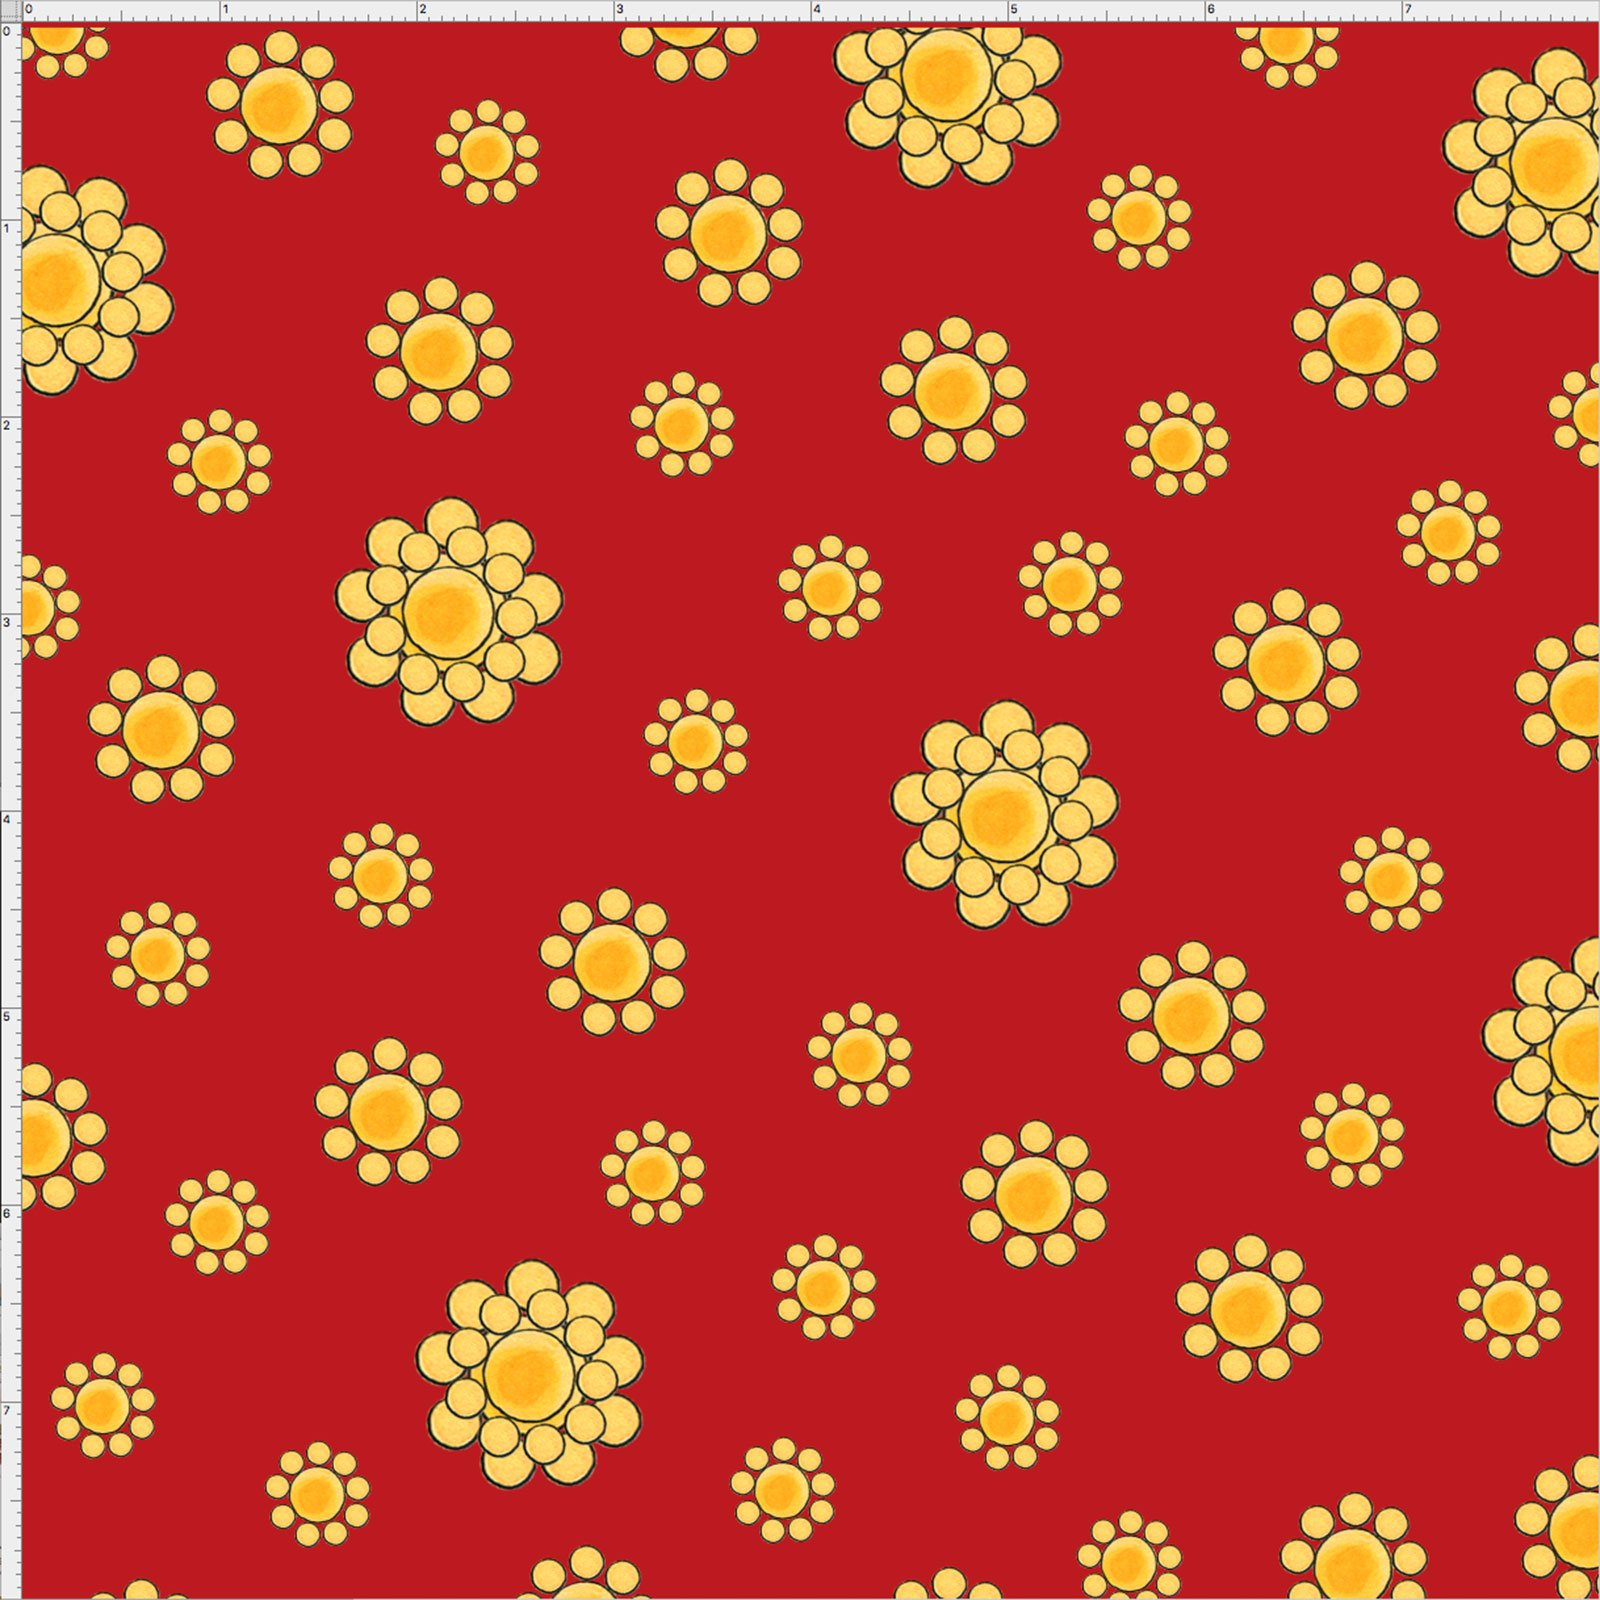 【Loralie Designs】- Bandana Dots Red Fabric-(ULH-178)